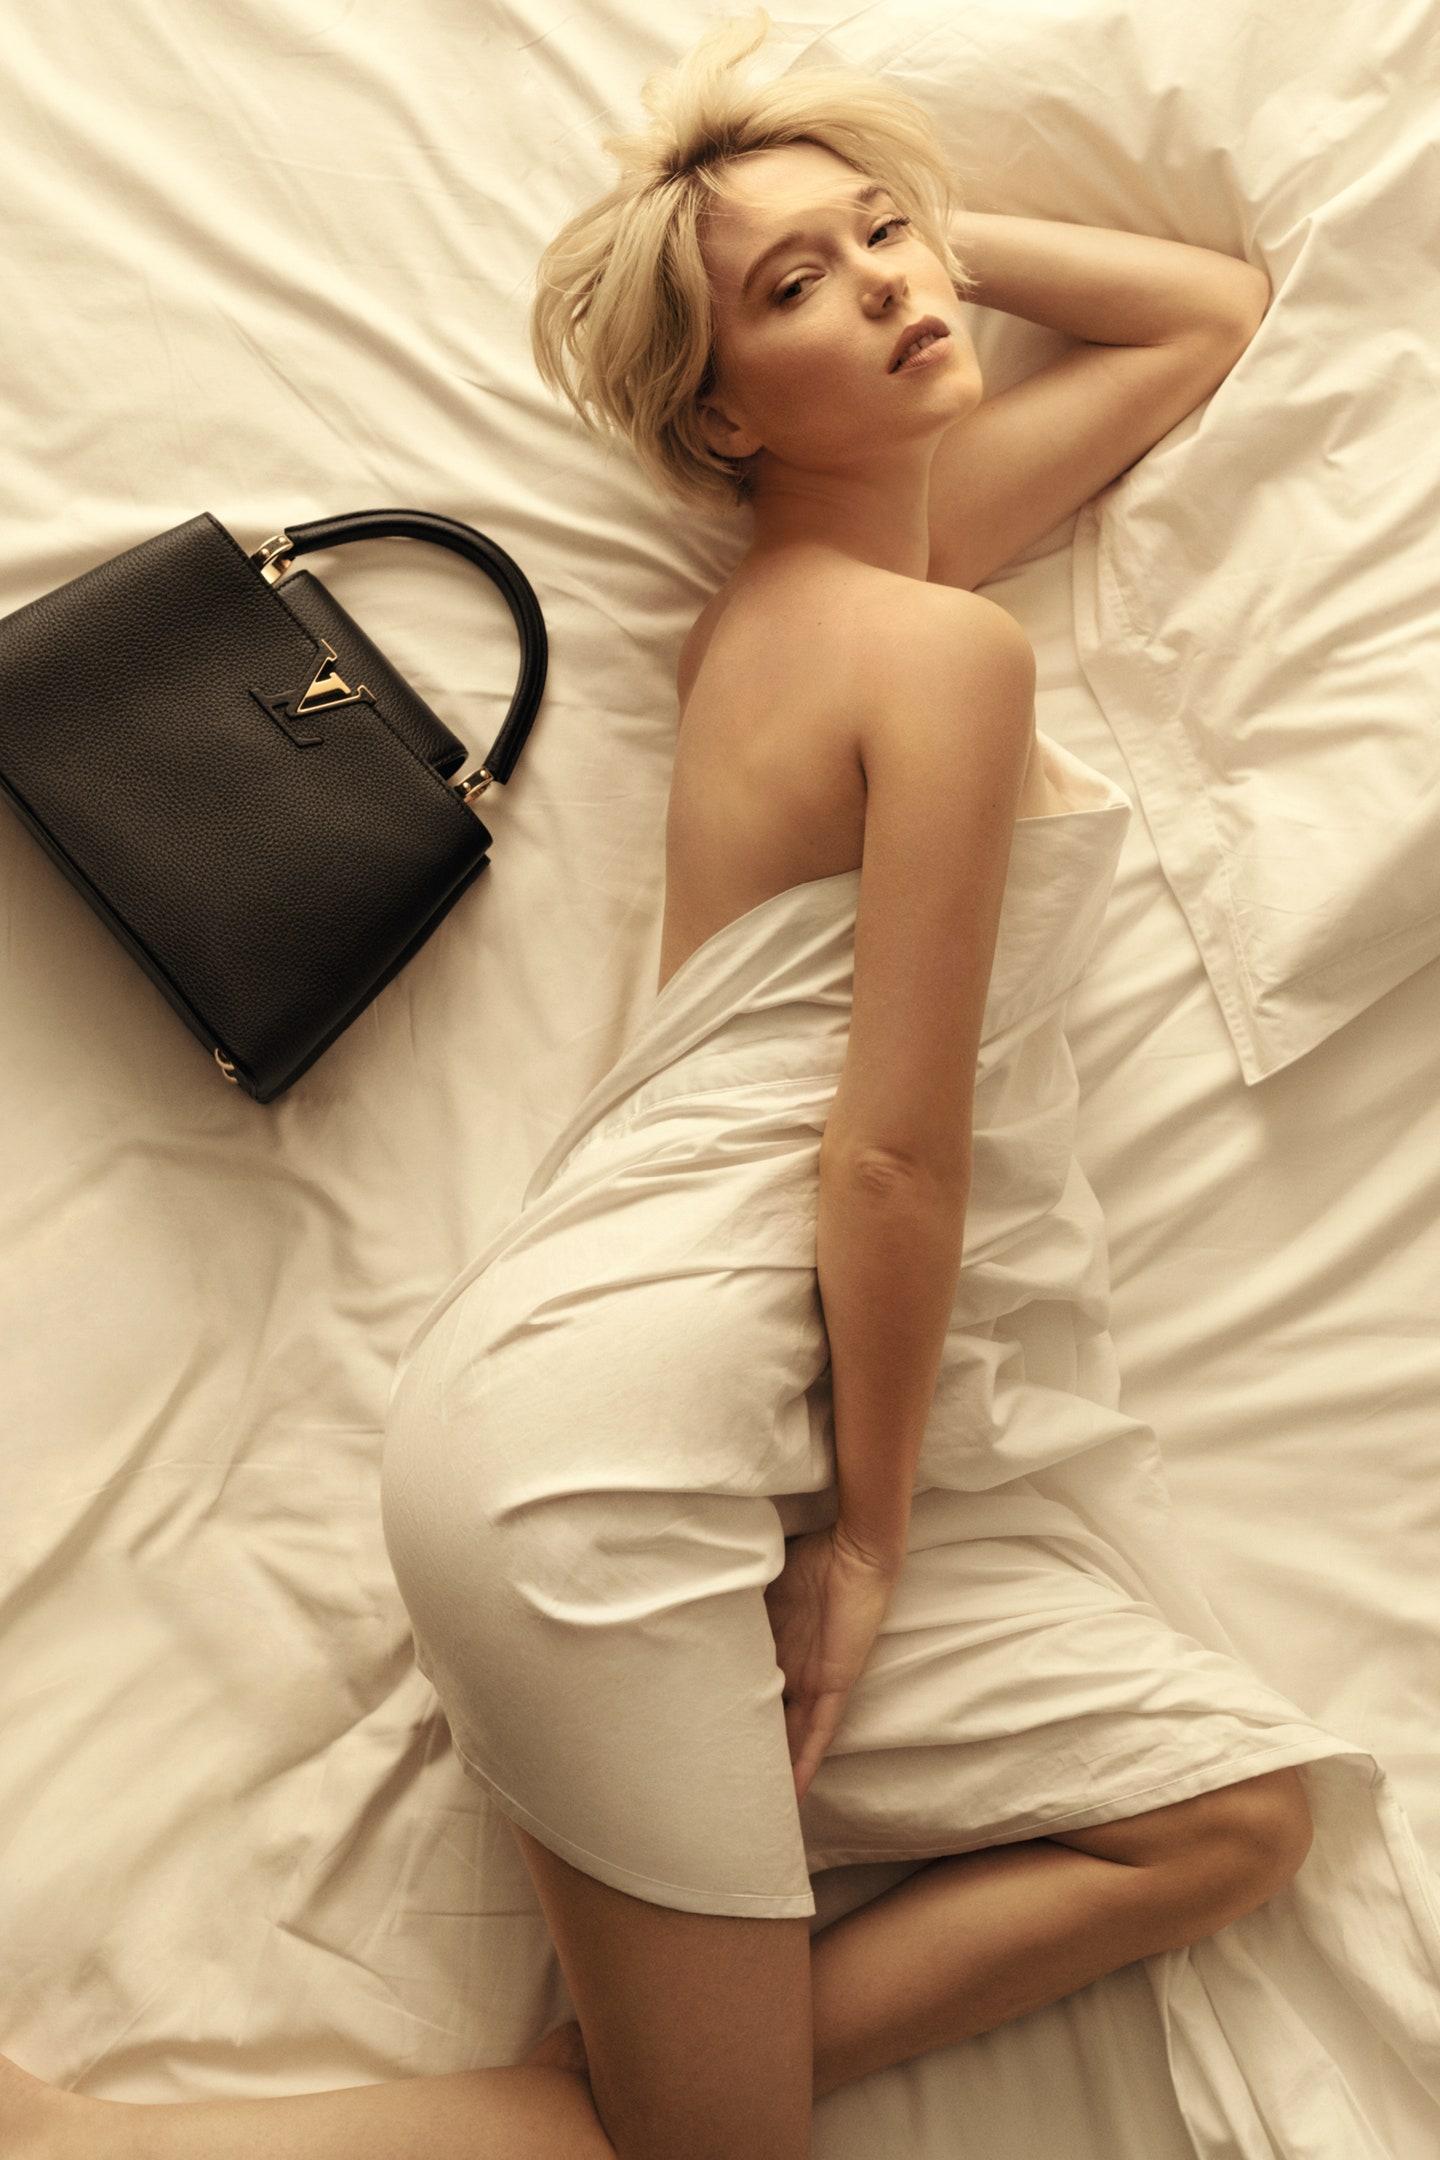 Lea Seydoux poses nude for Louis Vuitton\'s Capucines Campaign